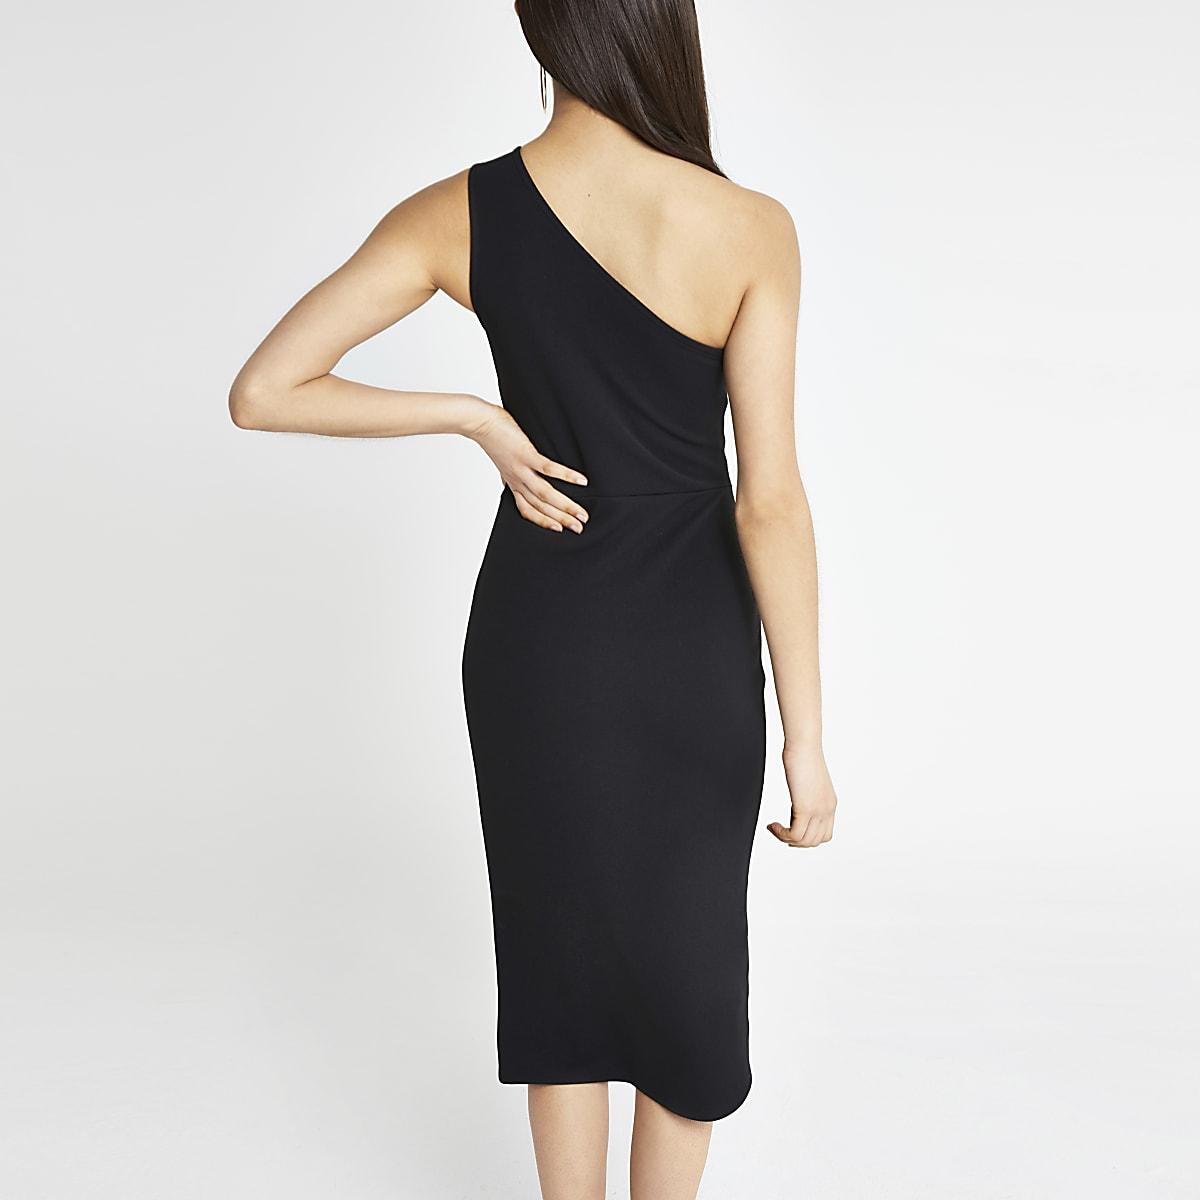 8a60122398c Black one shoulder rib bodycon dress - Bodycon Dresses - Dresses - women